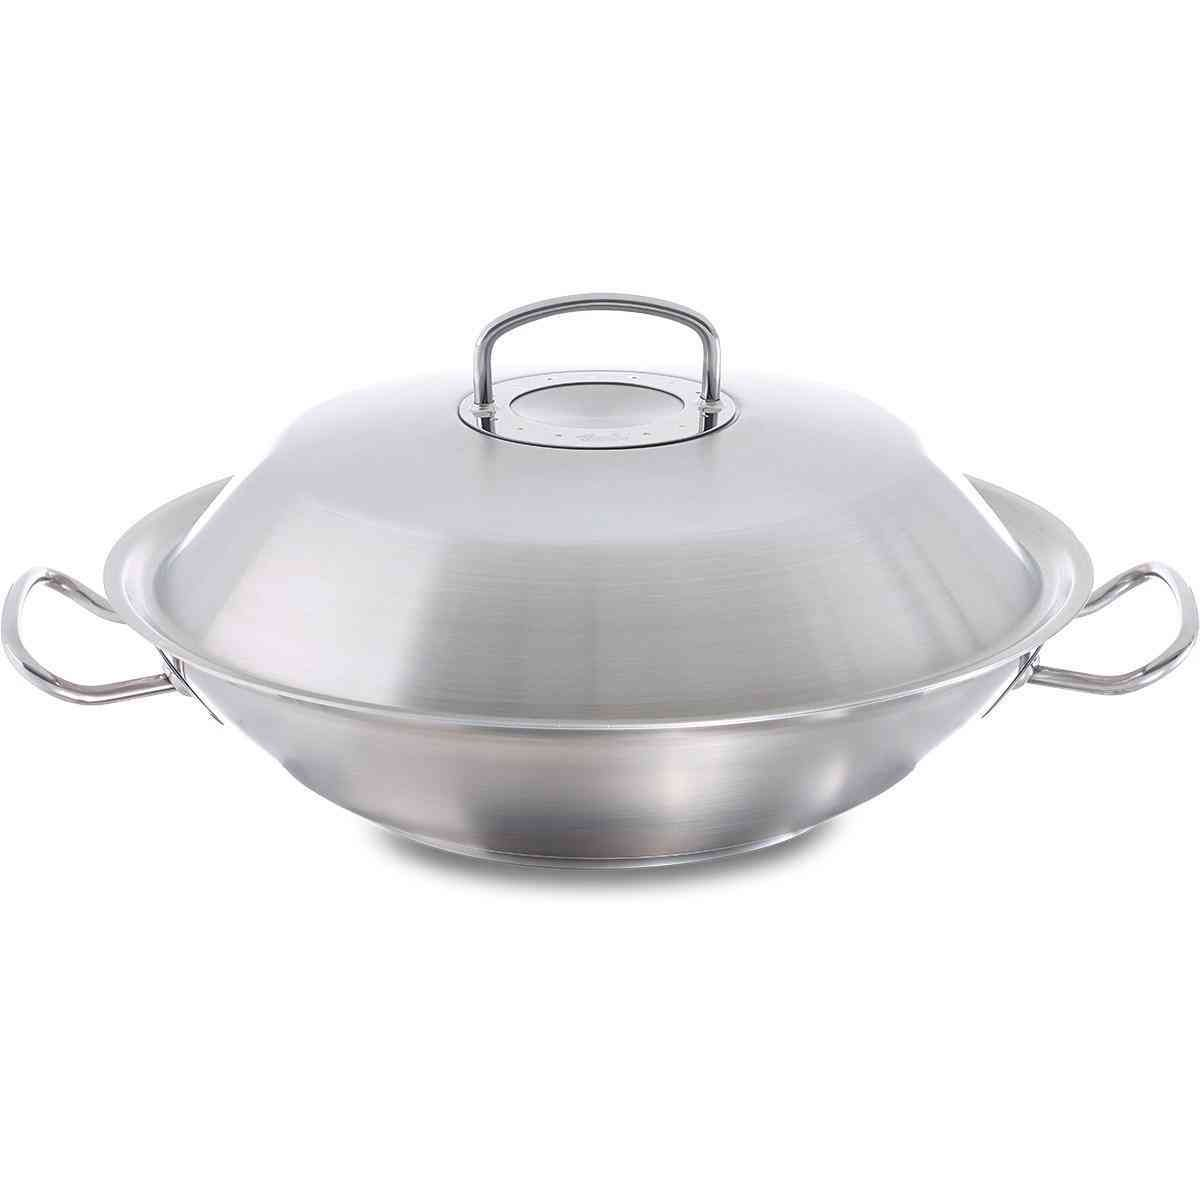 original-profi collection wok 30 cm with metal lid